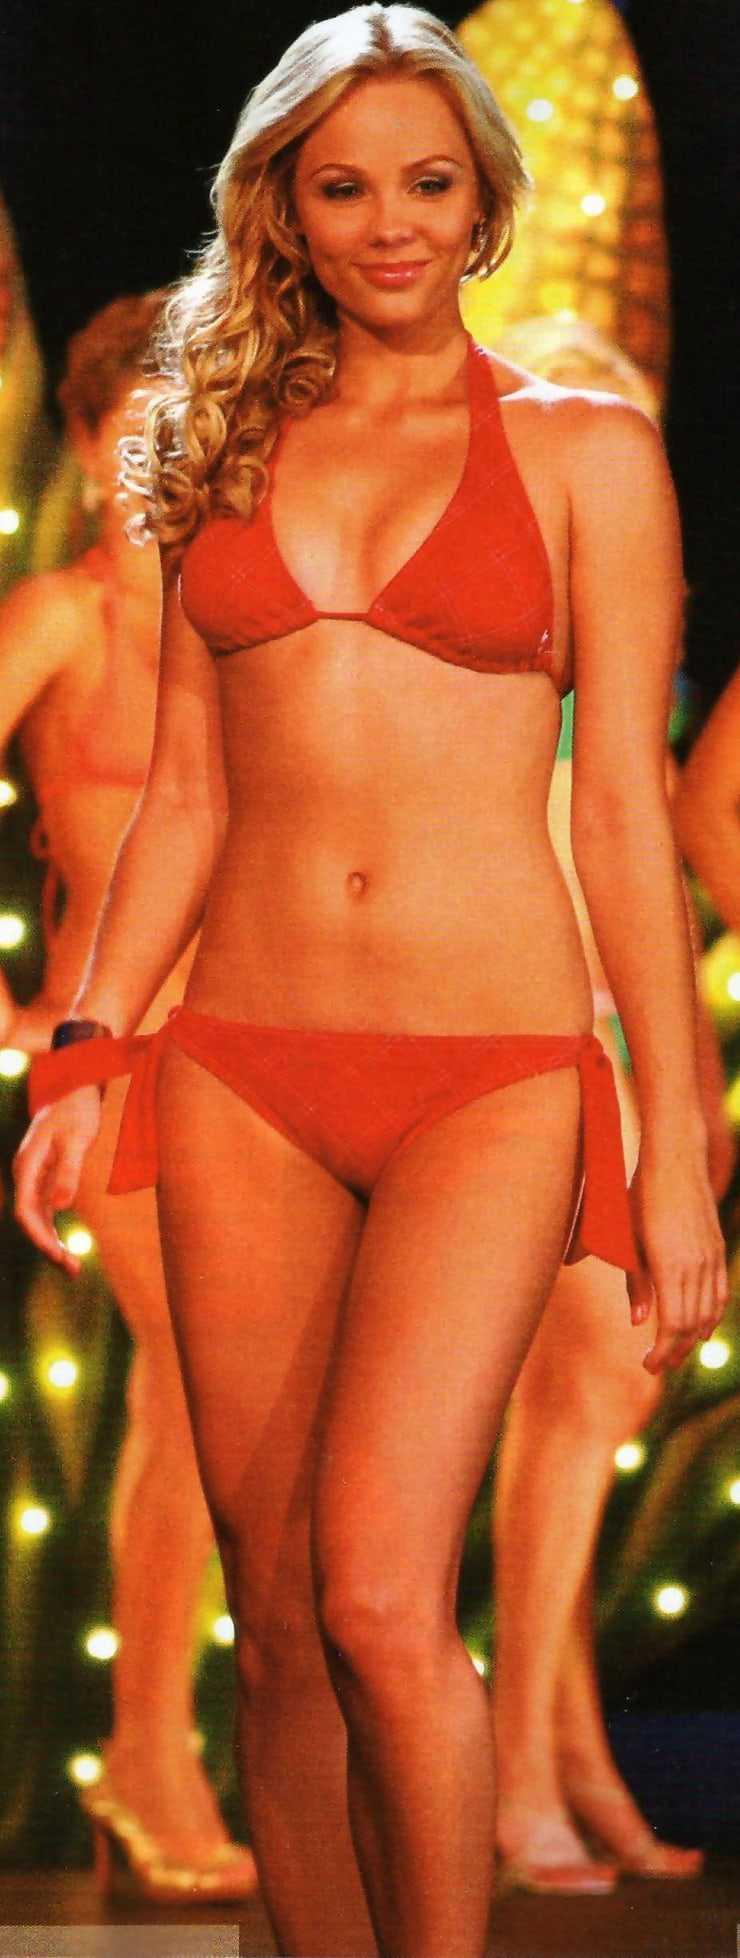 Laura Vandervoort sexy red bikini pics